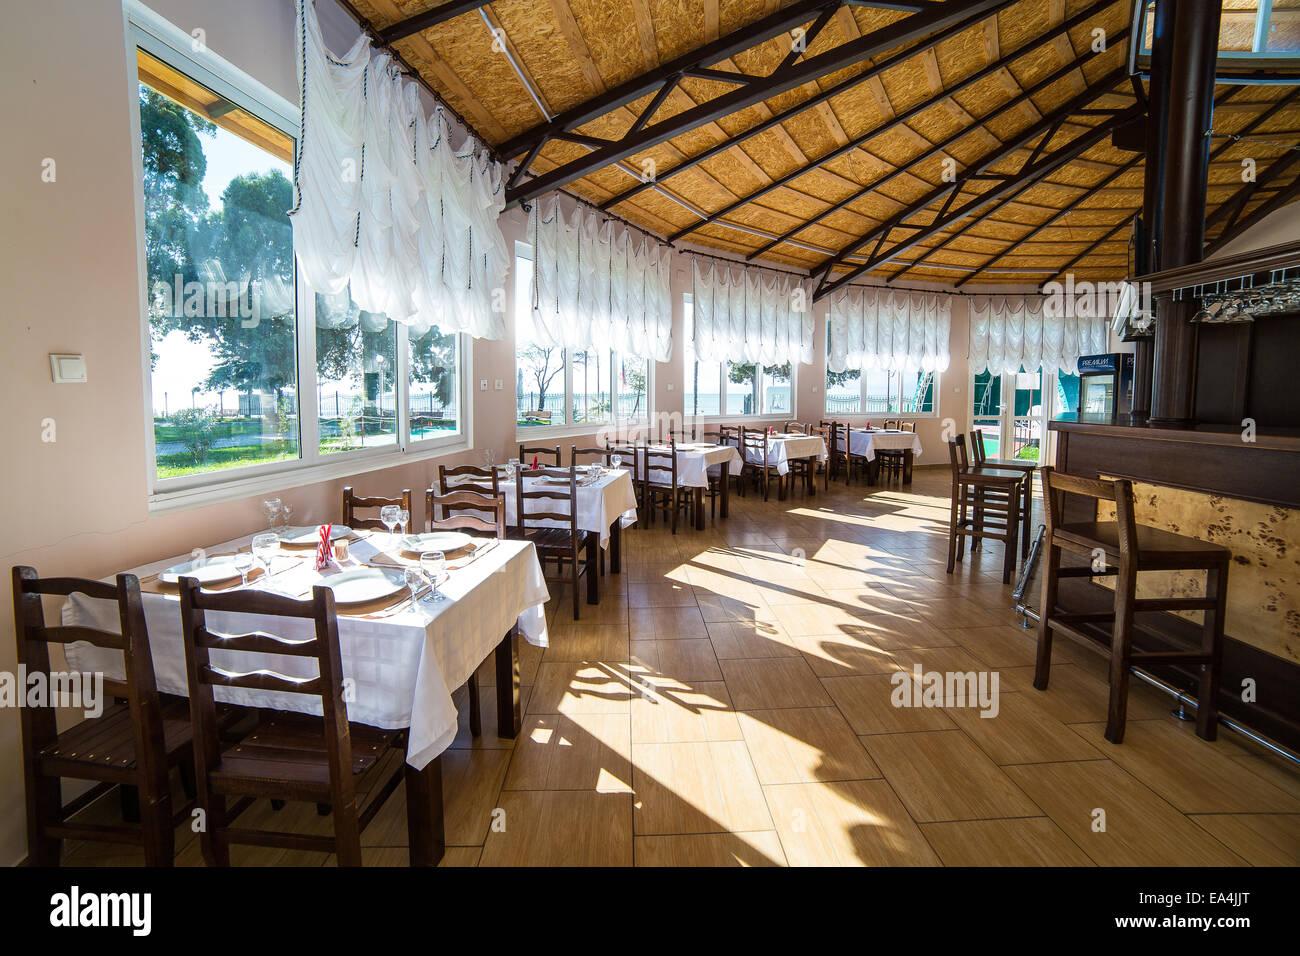 Lounge Bar Interior Design Stockfotos & Lounge Bar Interior Design ...